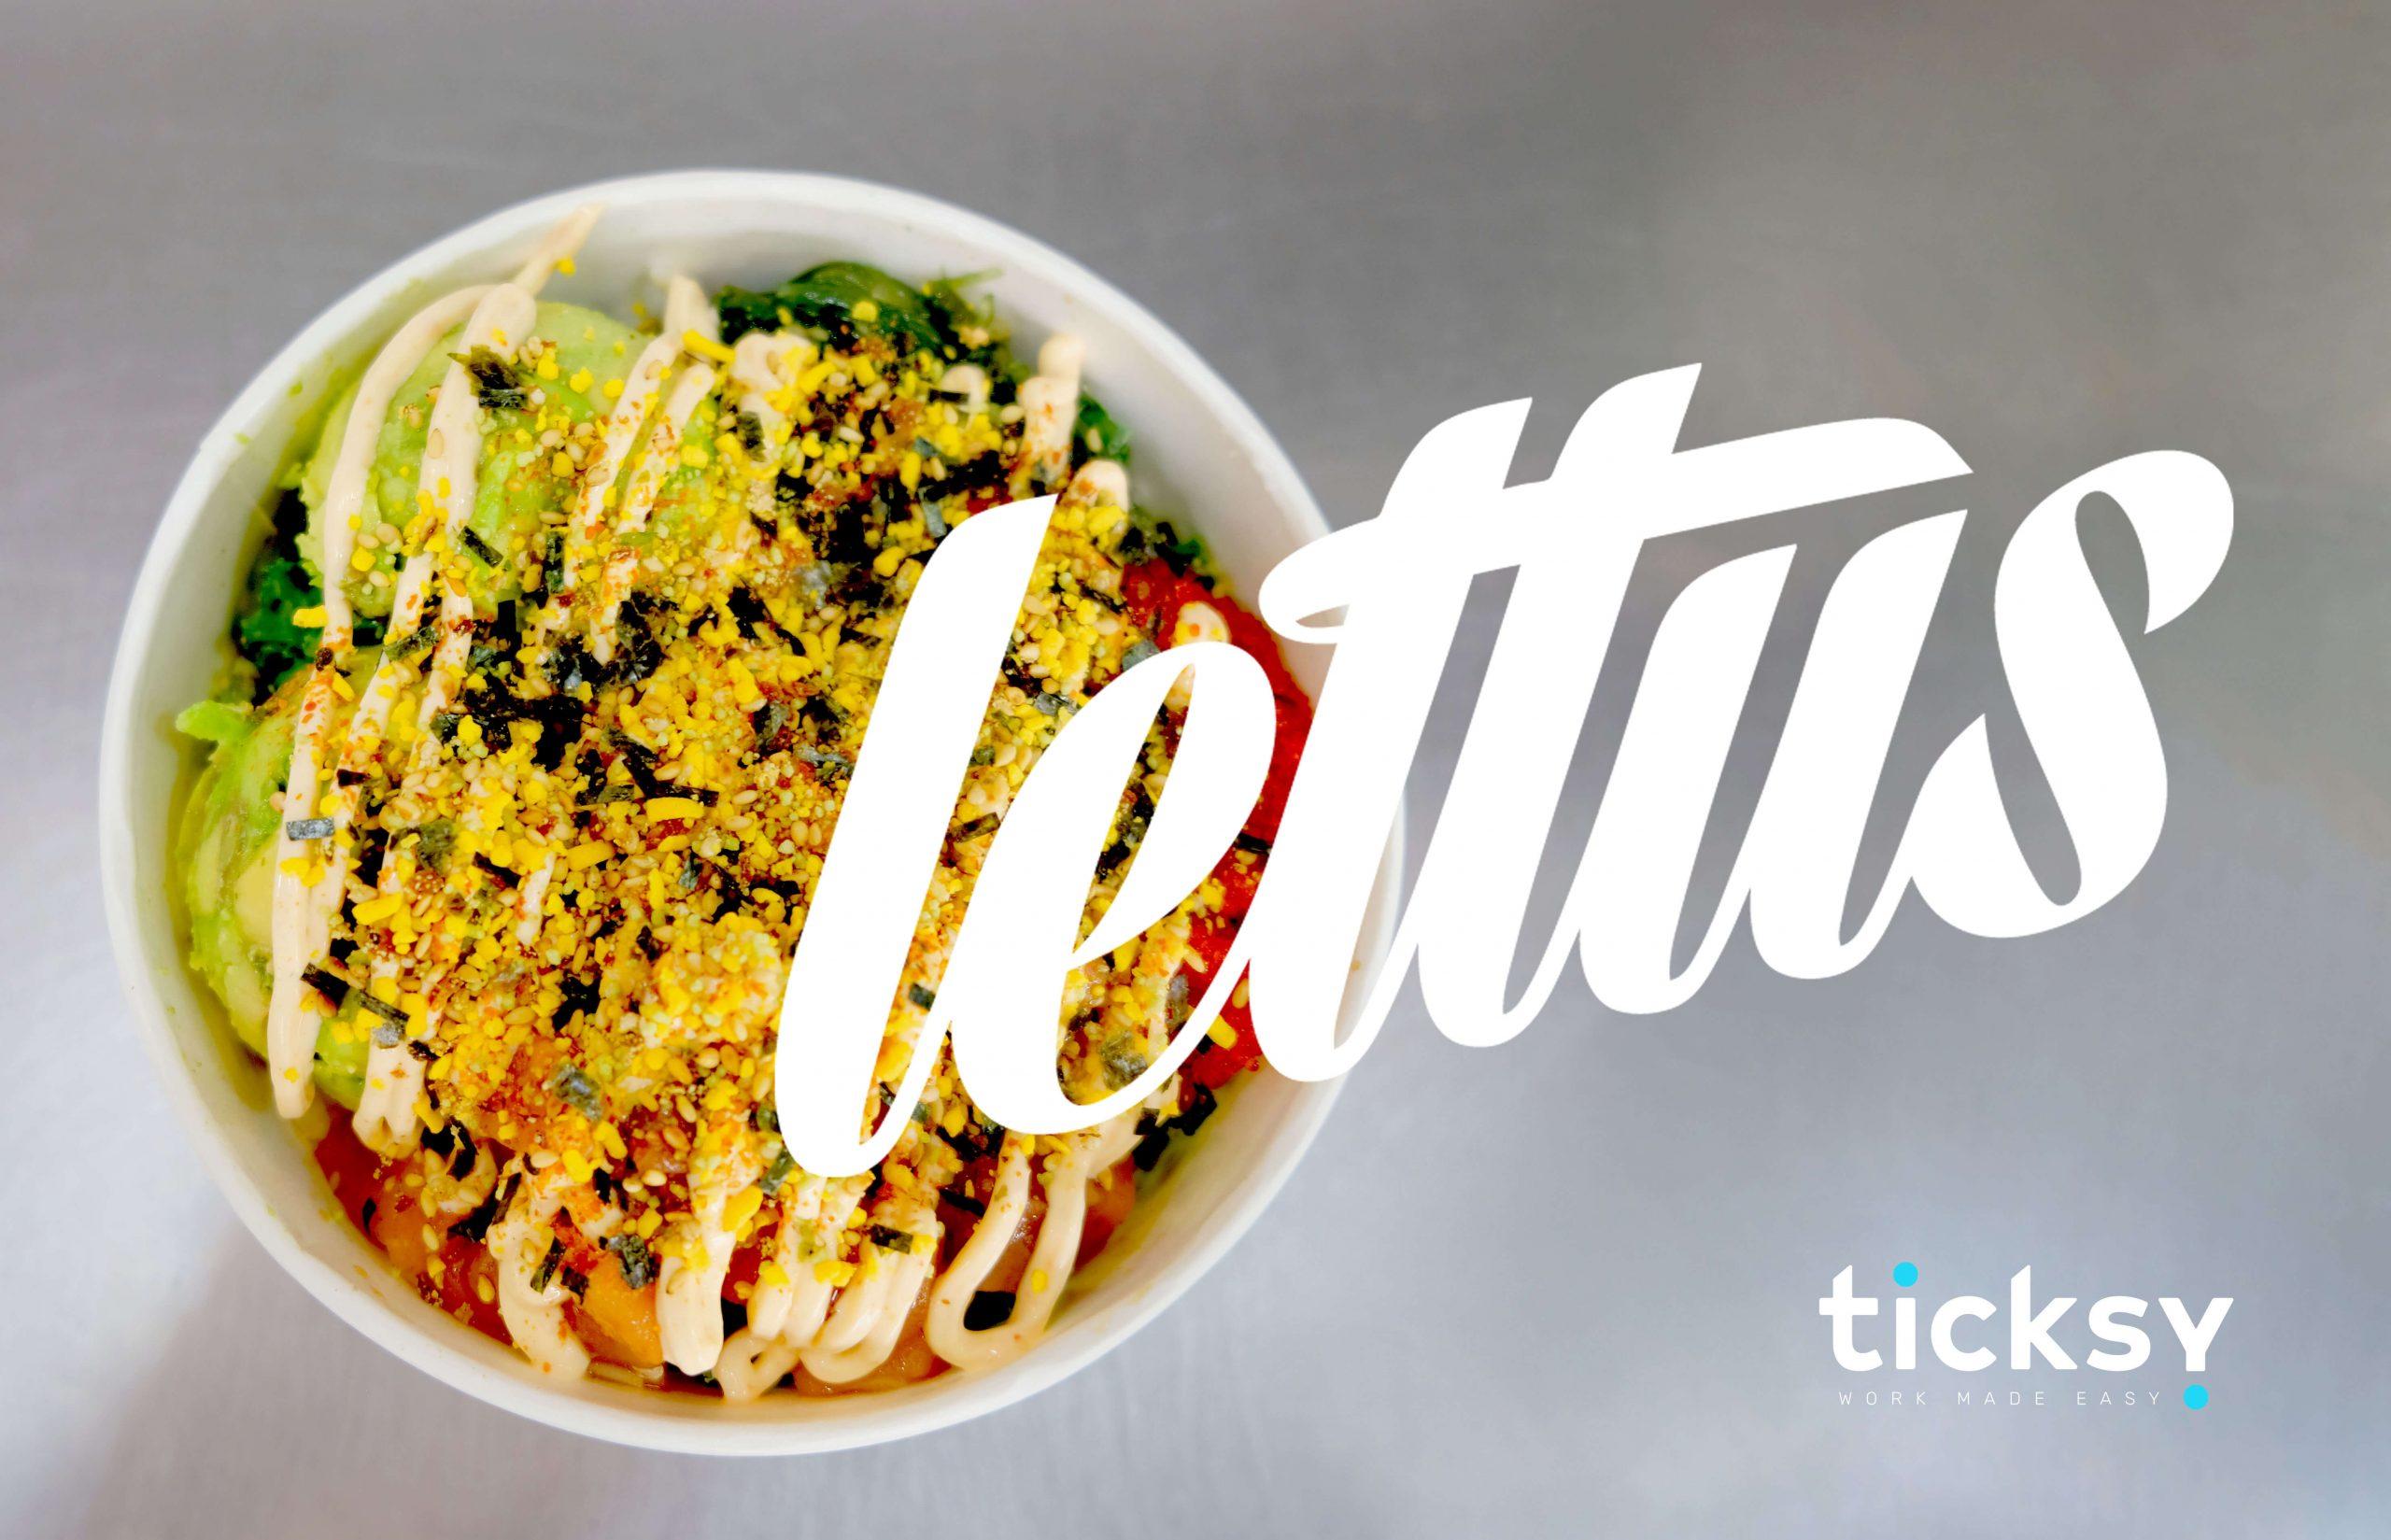 ticksy-con-lettus-malaga